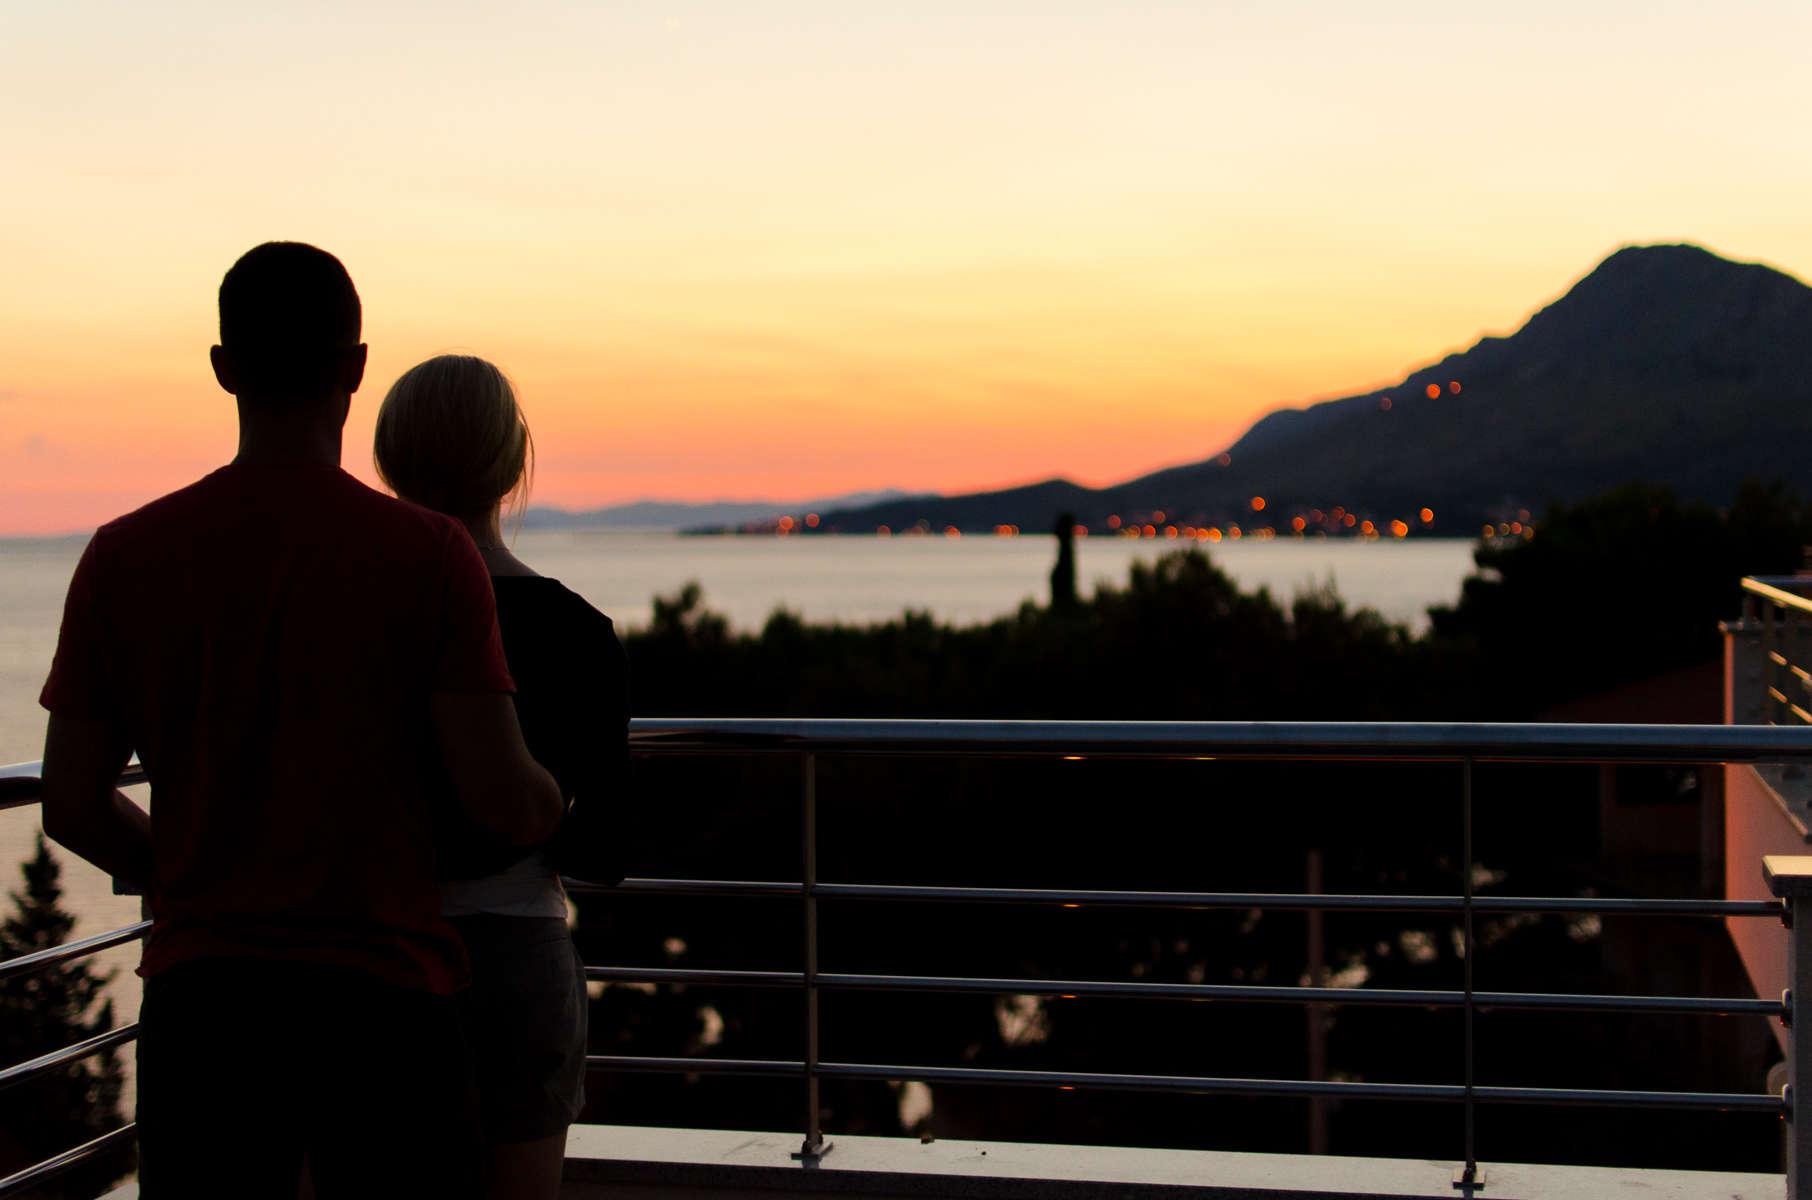 Couple stood on their balcony - KMJ family lawyers in London